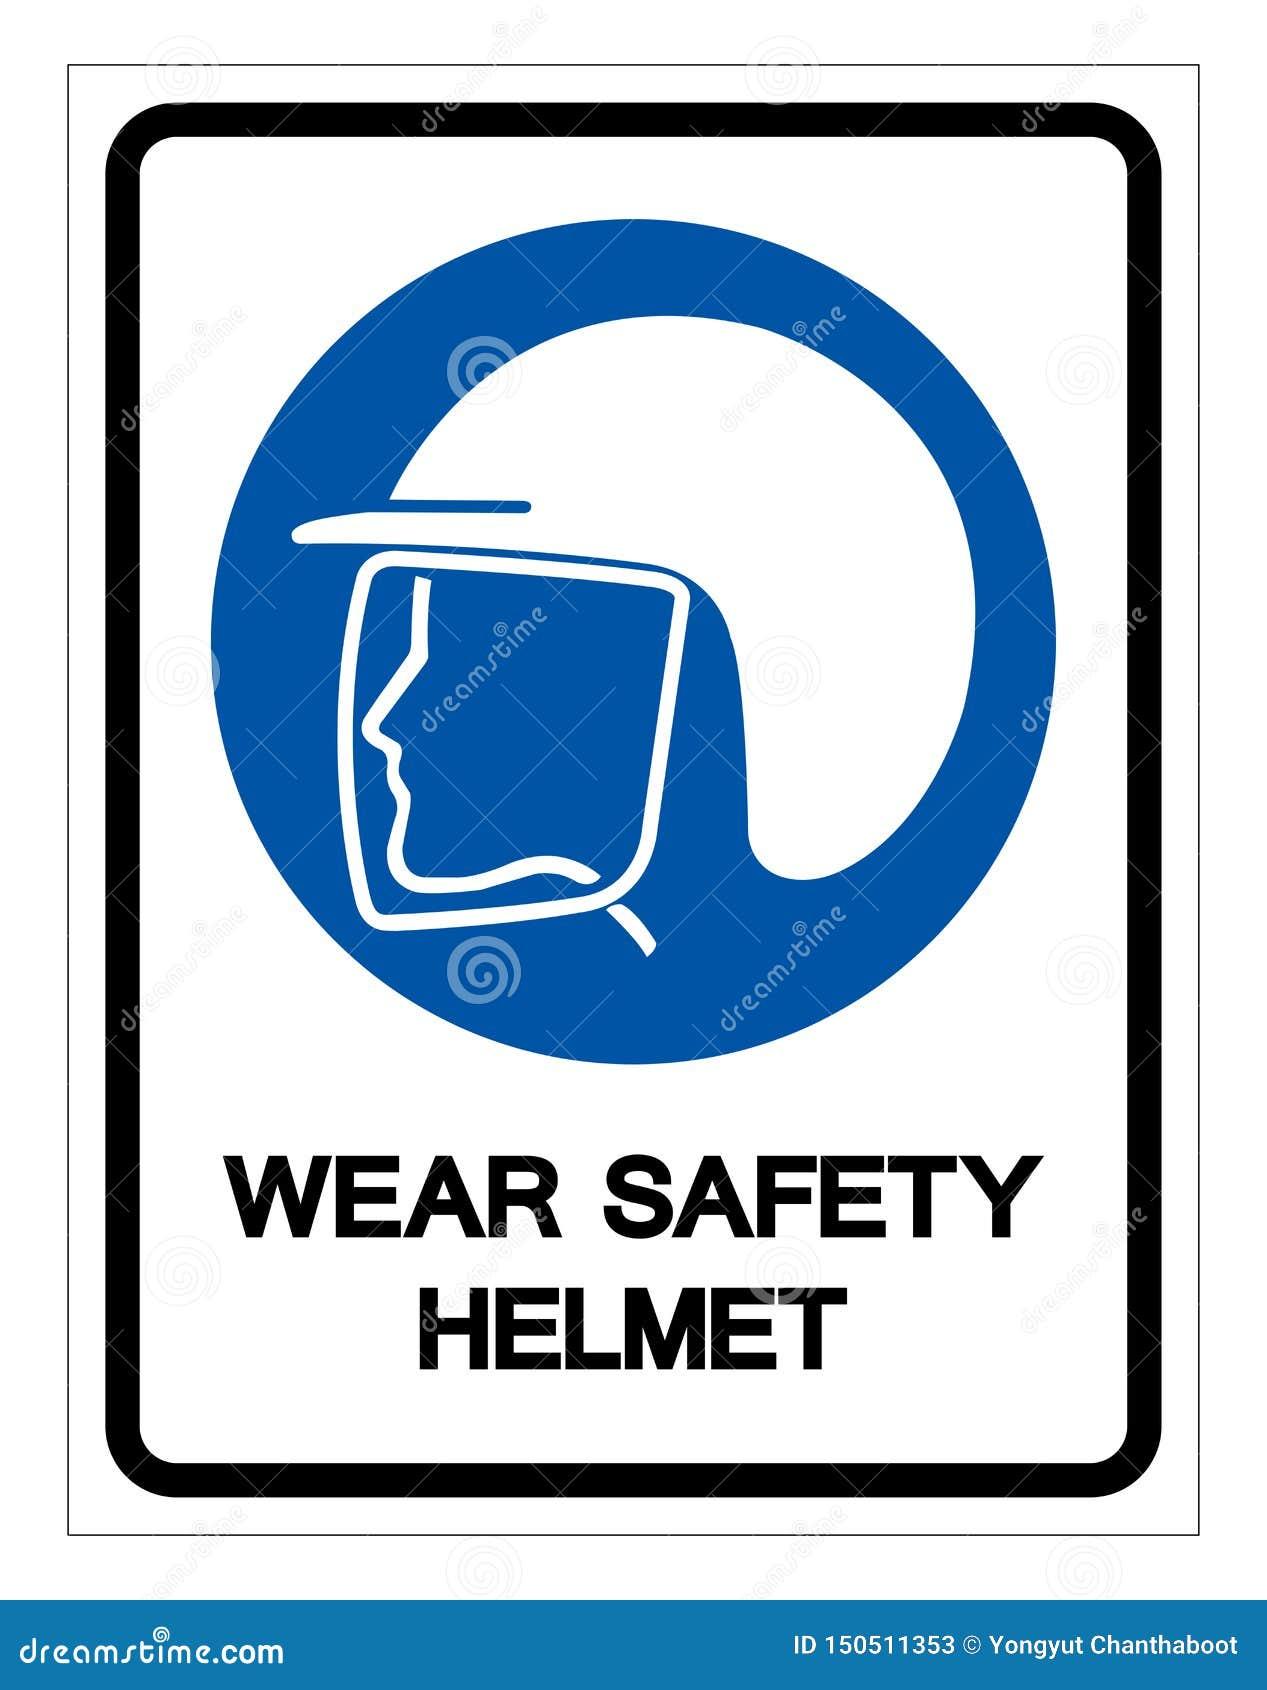 Wear Safety Helmet Symbol Sign,Vector Illustration